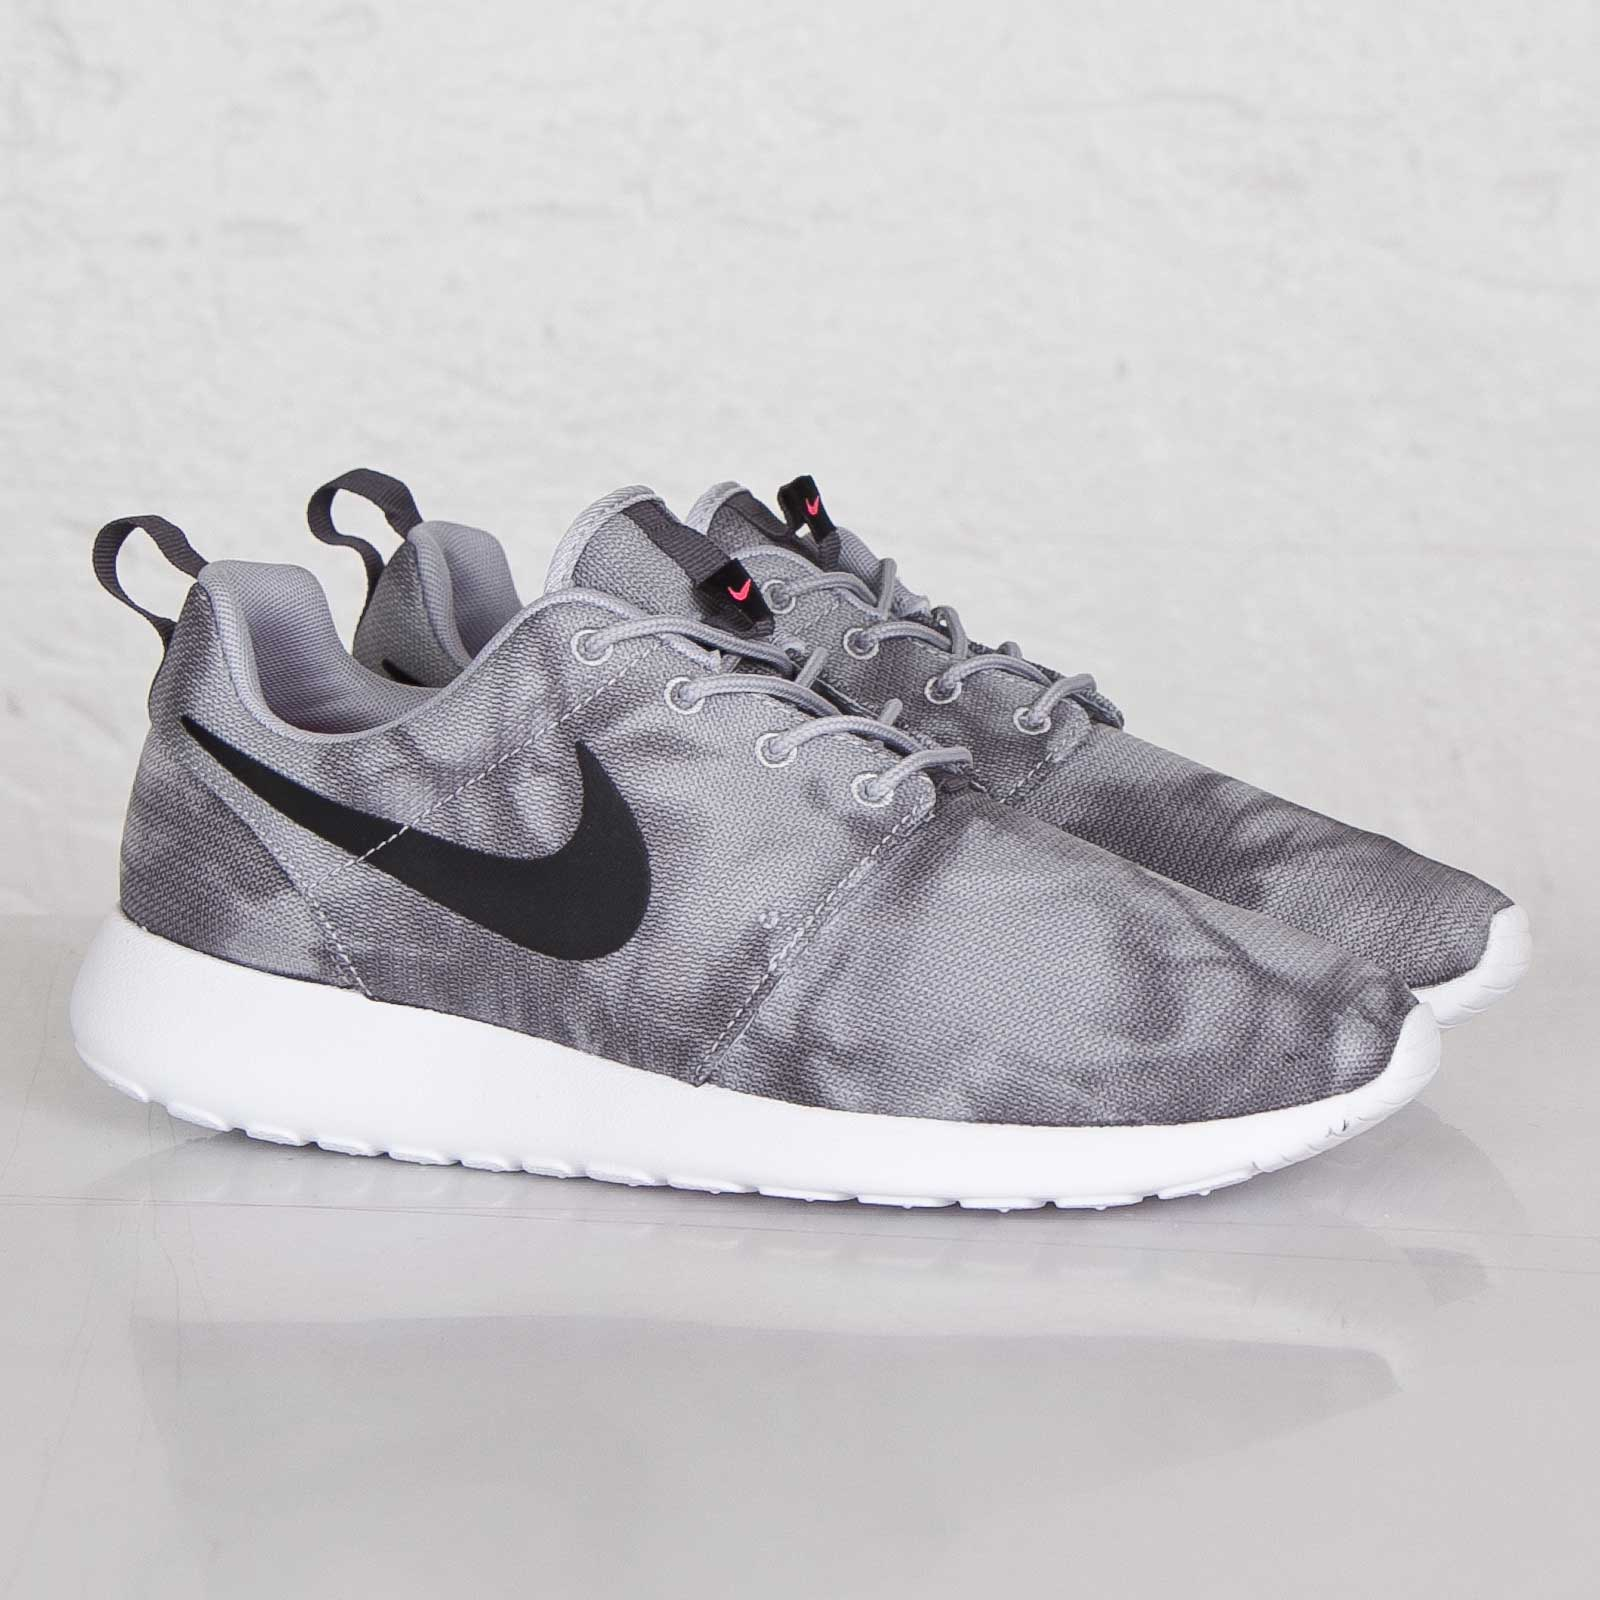 5609356a0f1 Nike Roshe Run Print - 655206-001 - Sneakersnstuff